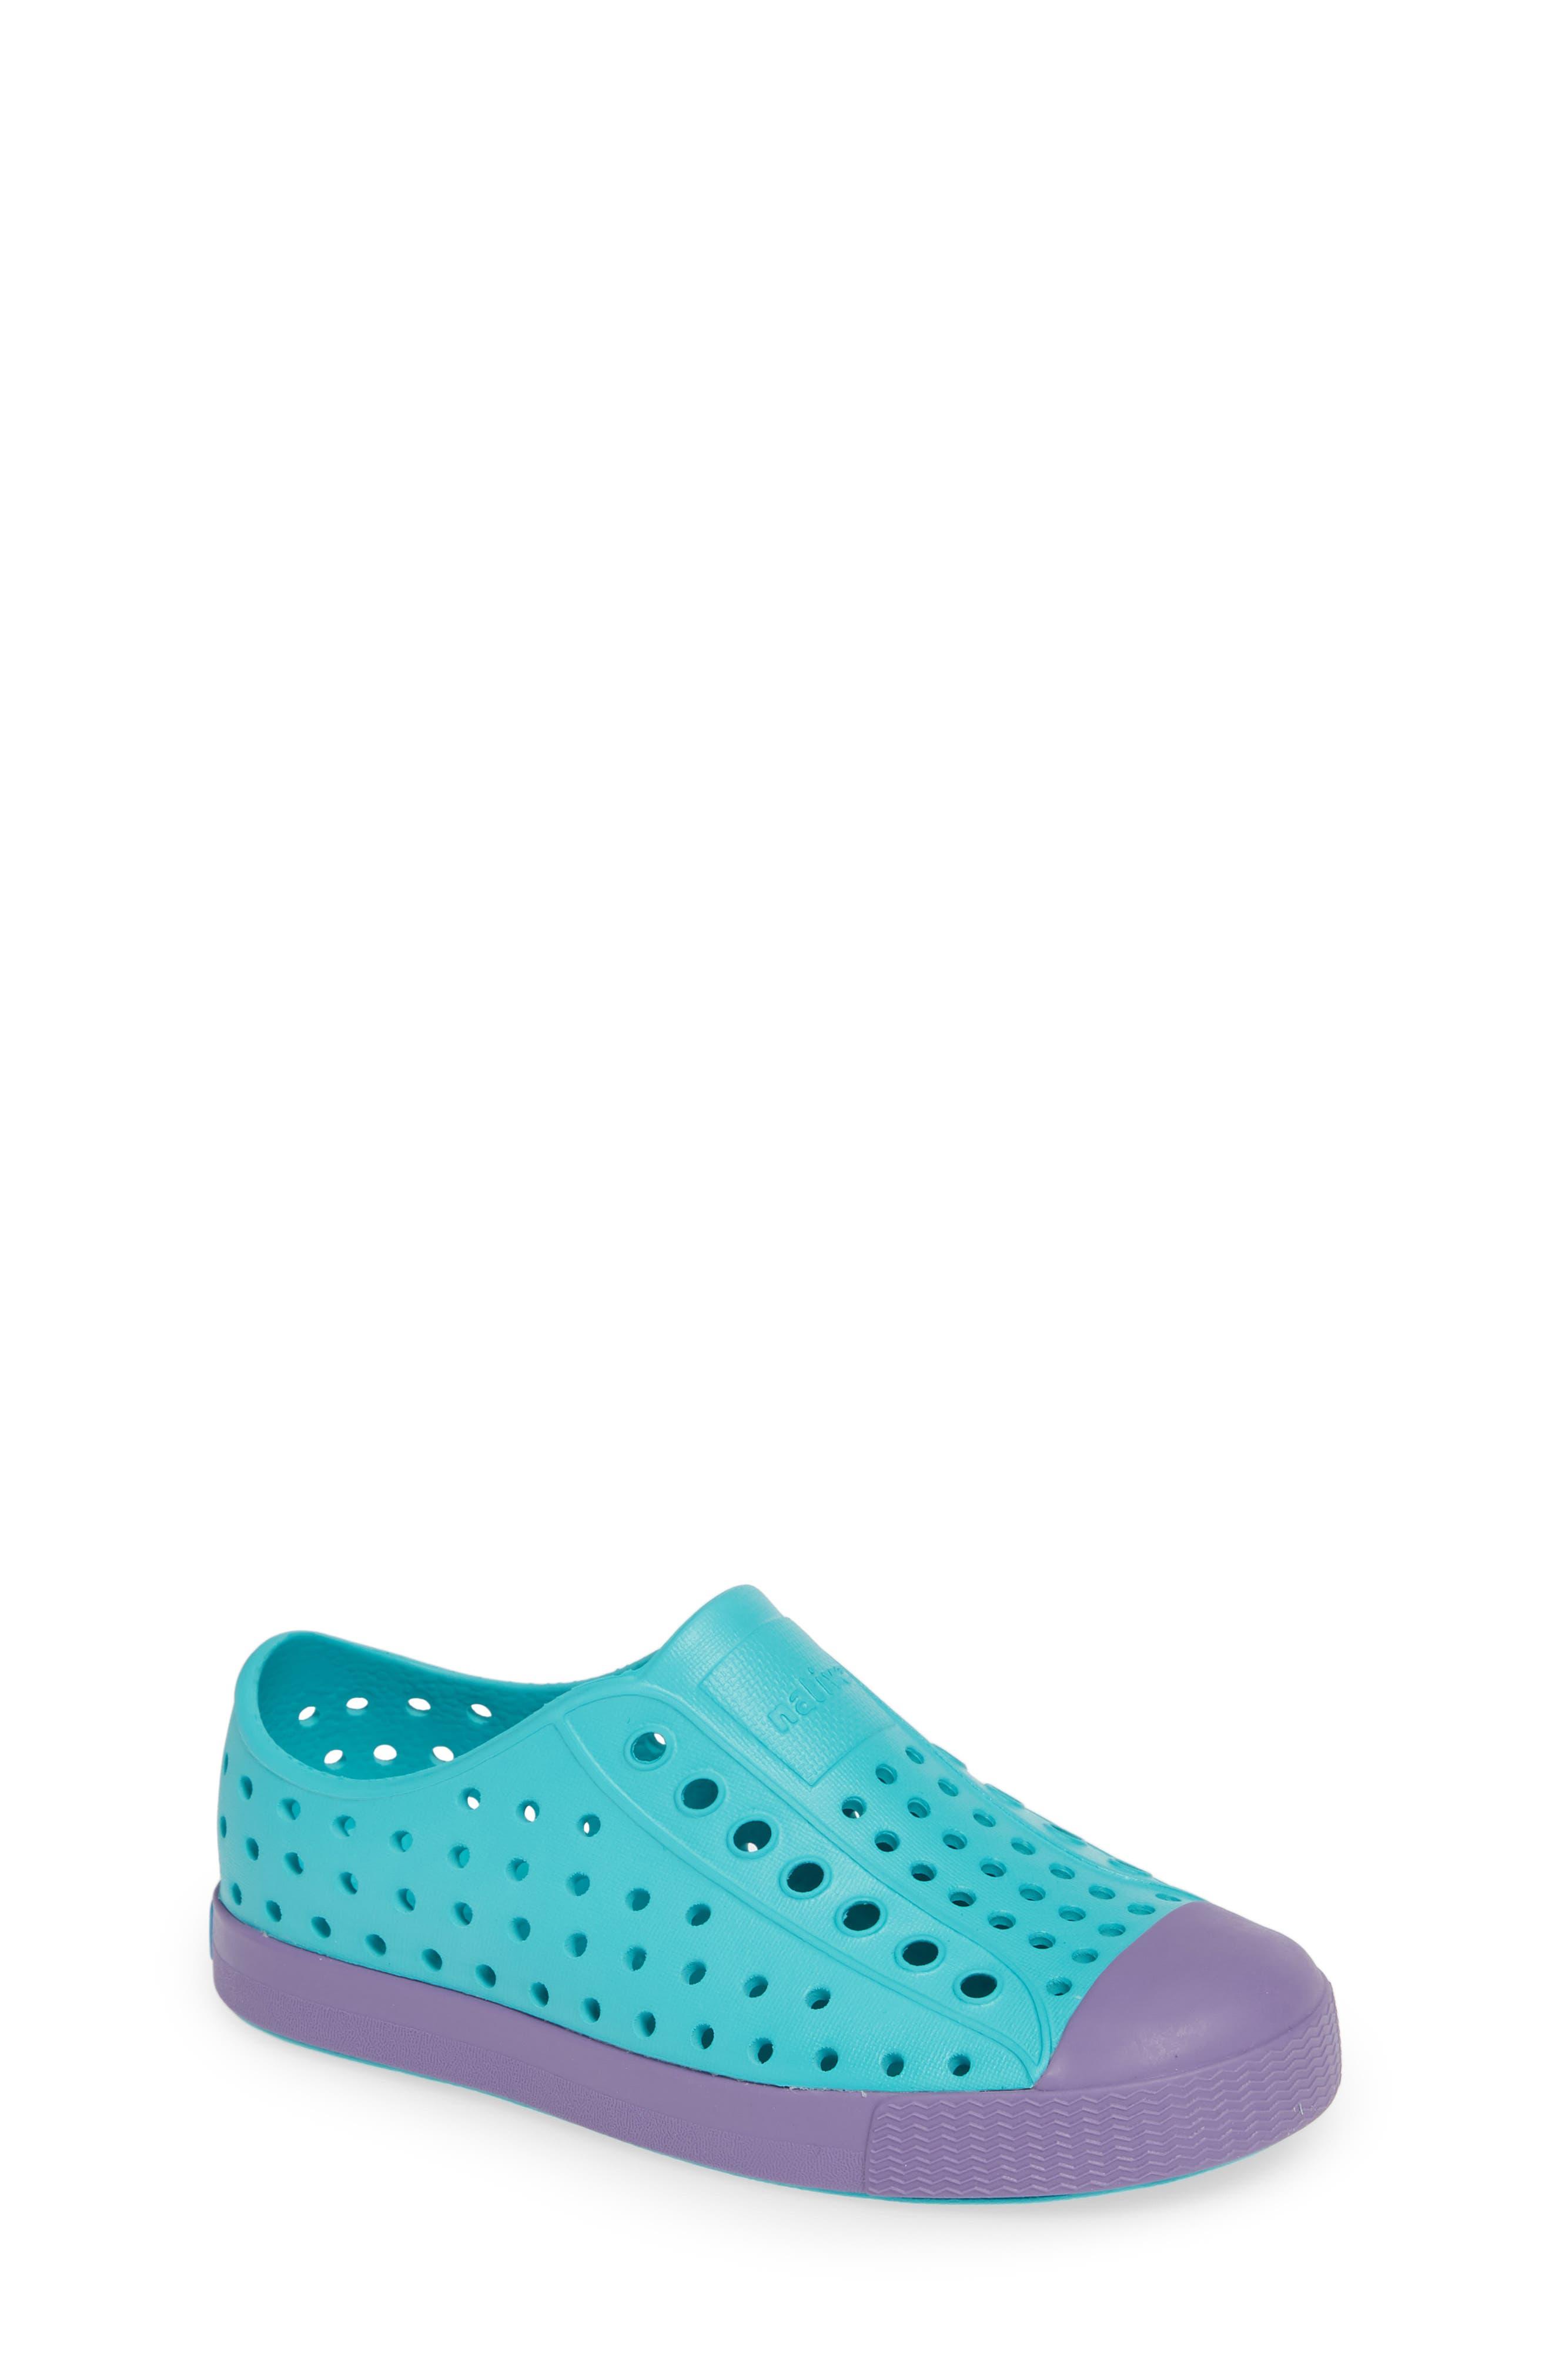 'Jefferson' Water Friendly Slip-On Sneaker,                             Main thumbnail 19, color,